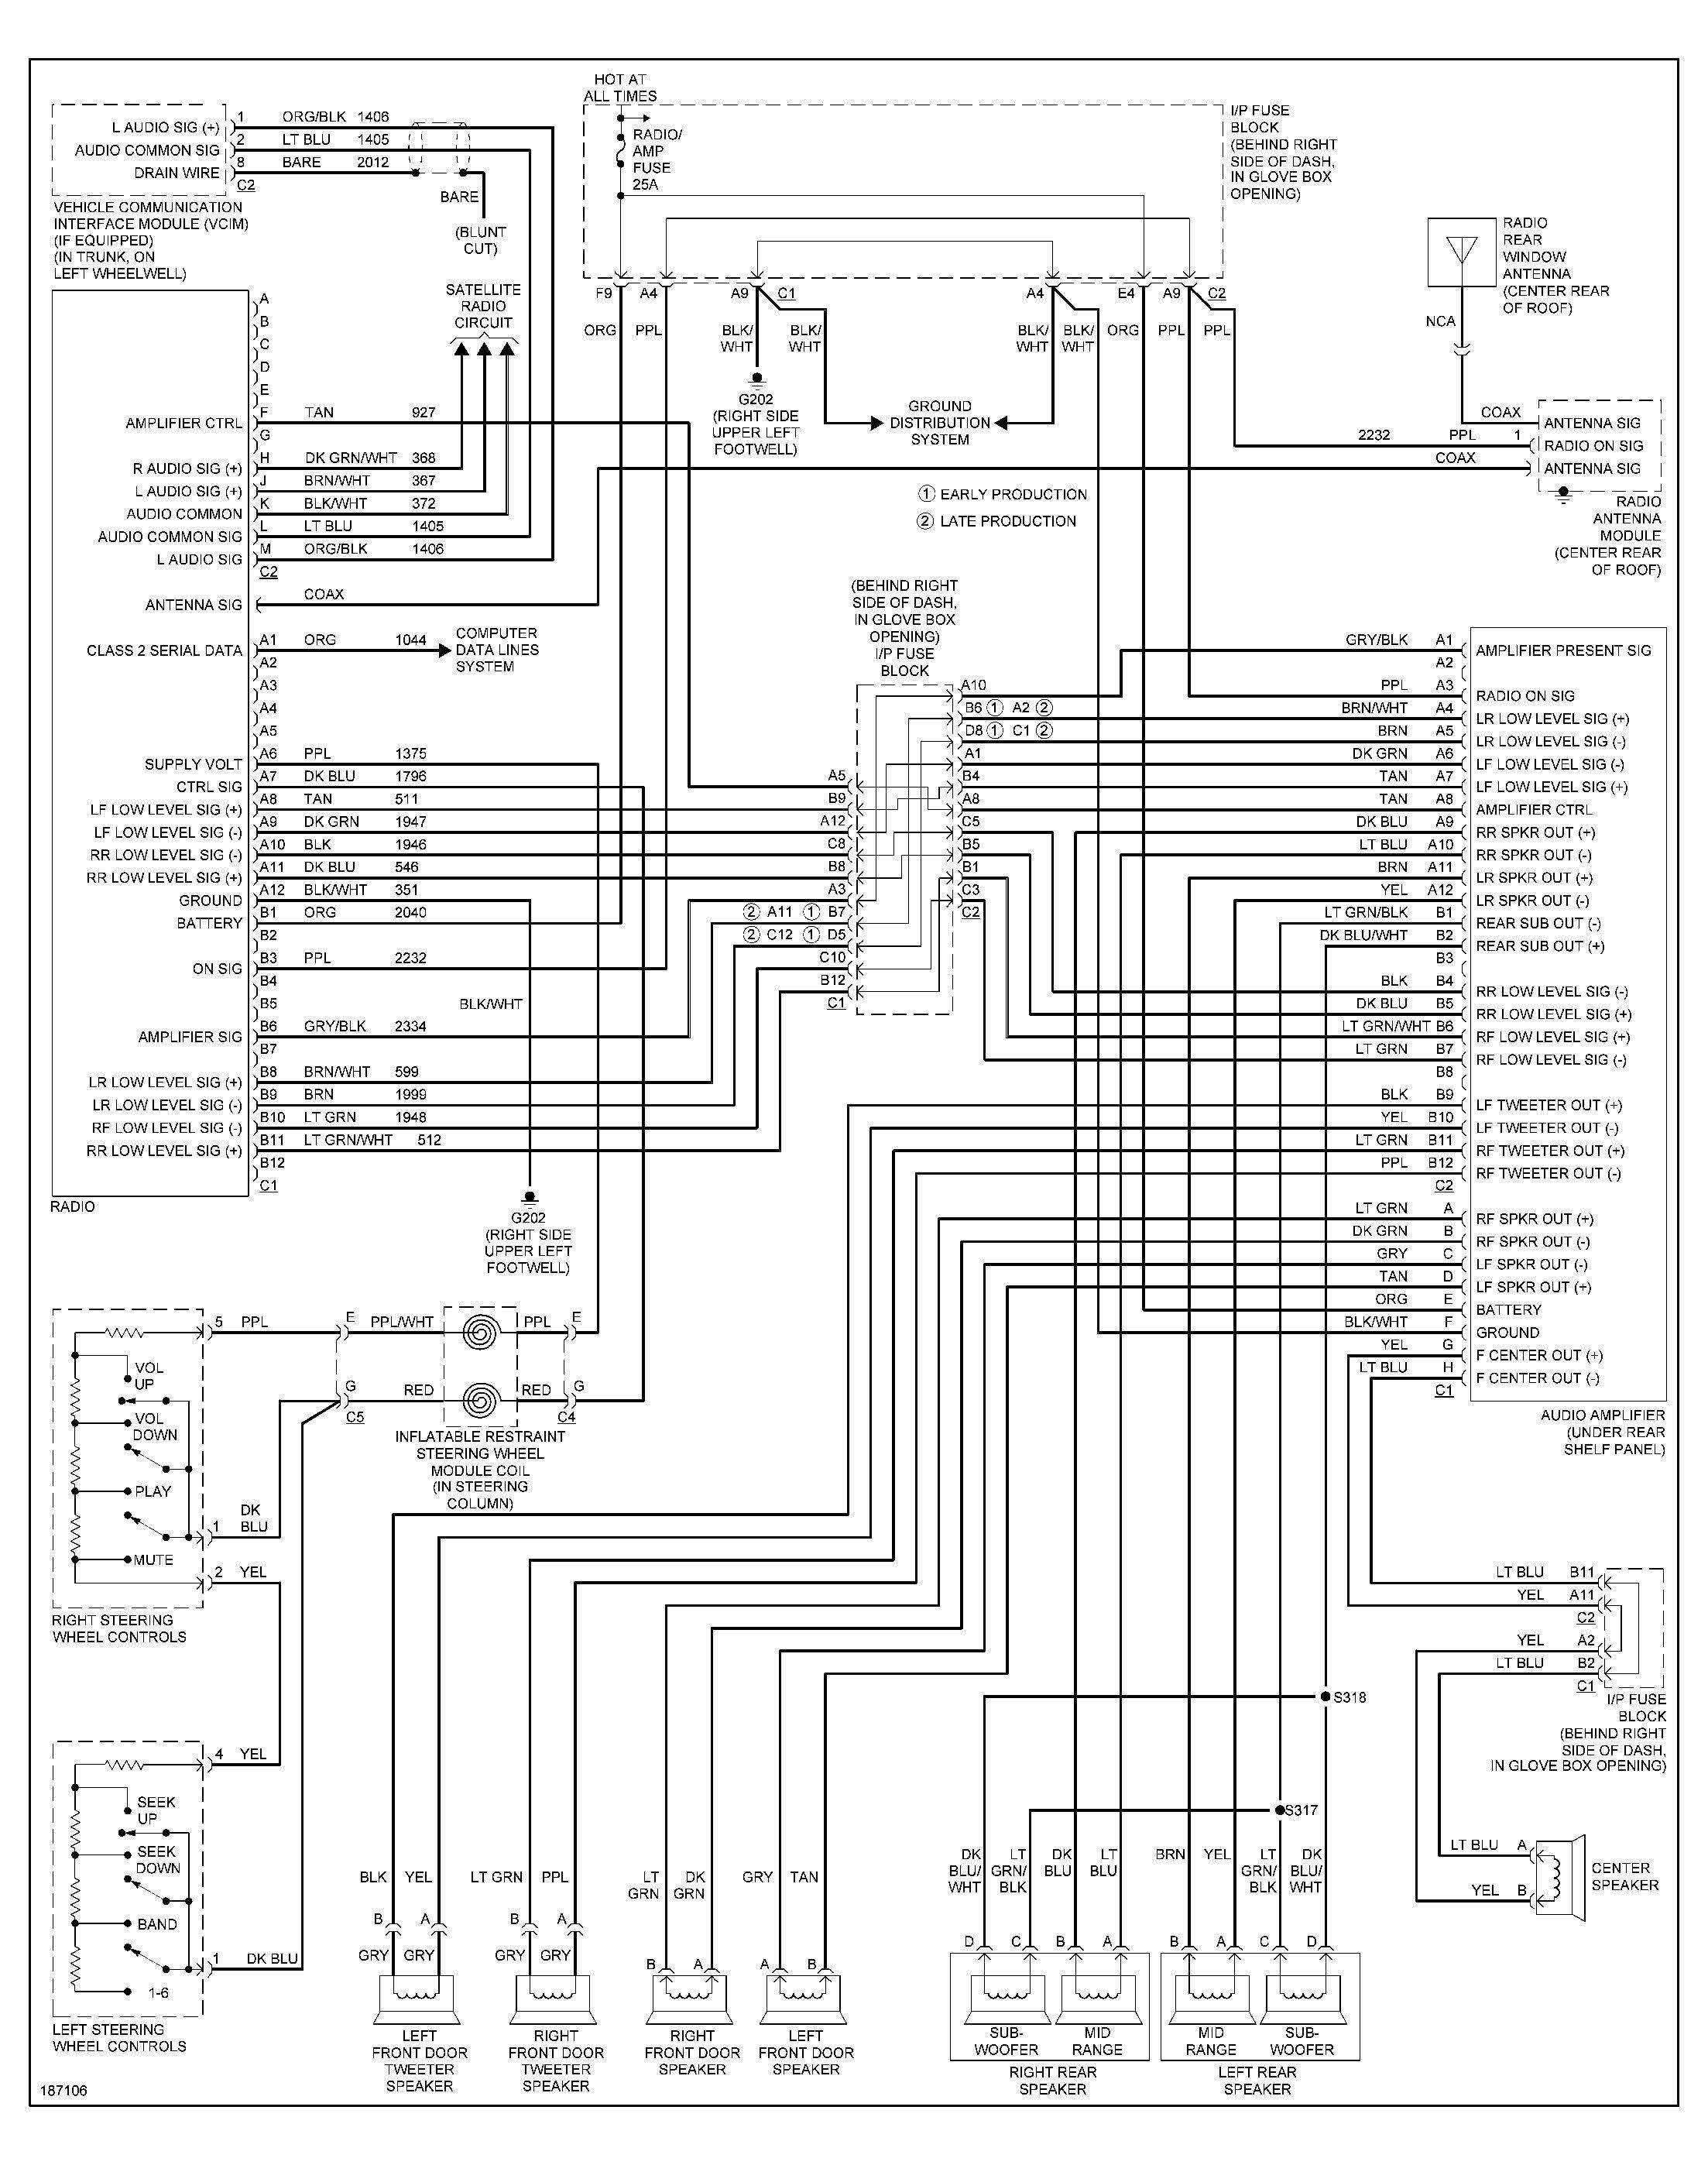 New 1997 Jeep Grand Cherokee Laredo Wiring Diagram